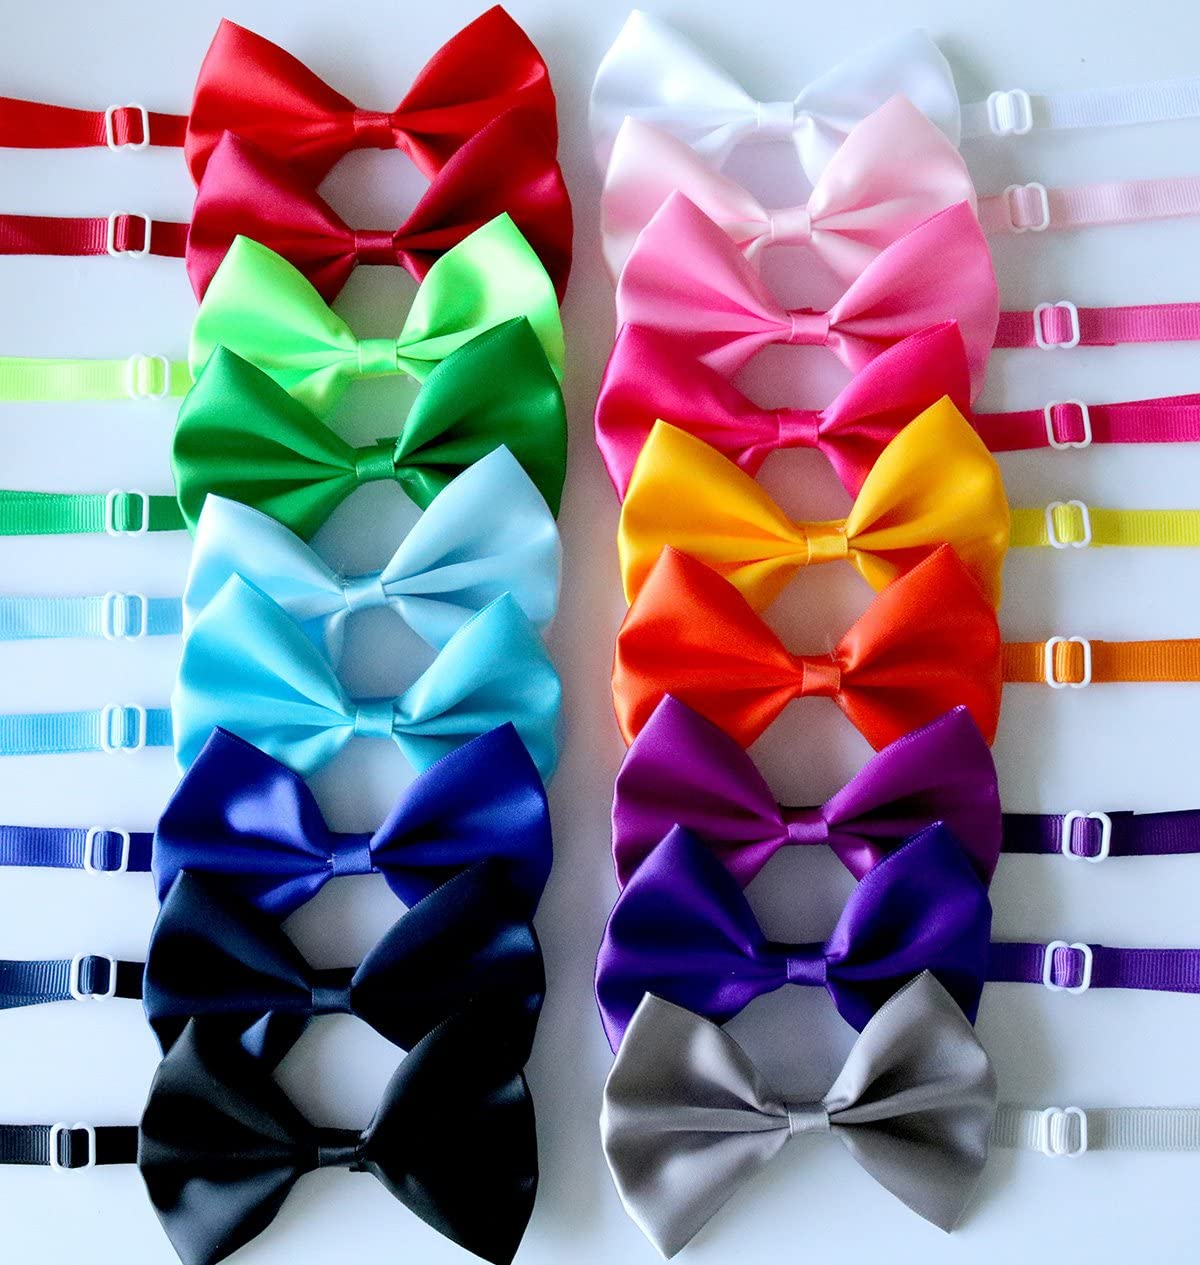 yagopet 20pcs Pet Dog Bow tie Dog Bowtie Collar Mix 18 Colors Solid Dog Ties Adjustable Pet Pet Collars Dog Grooming Accessories